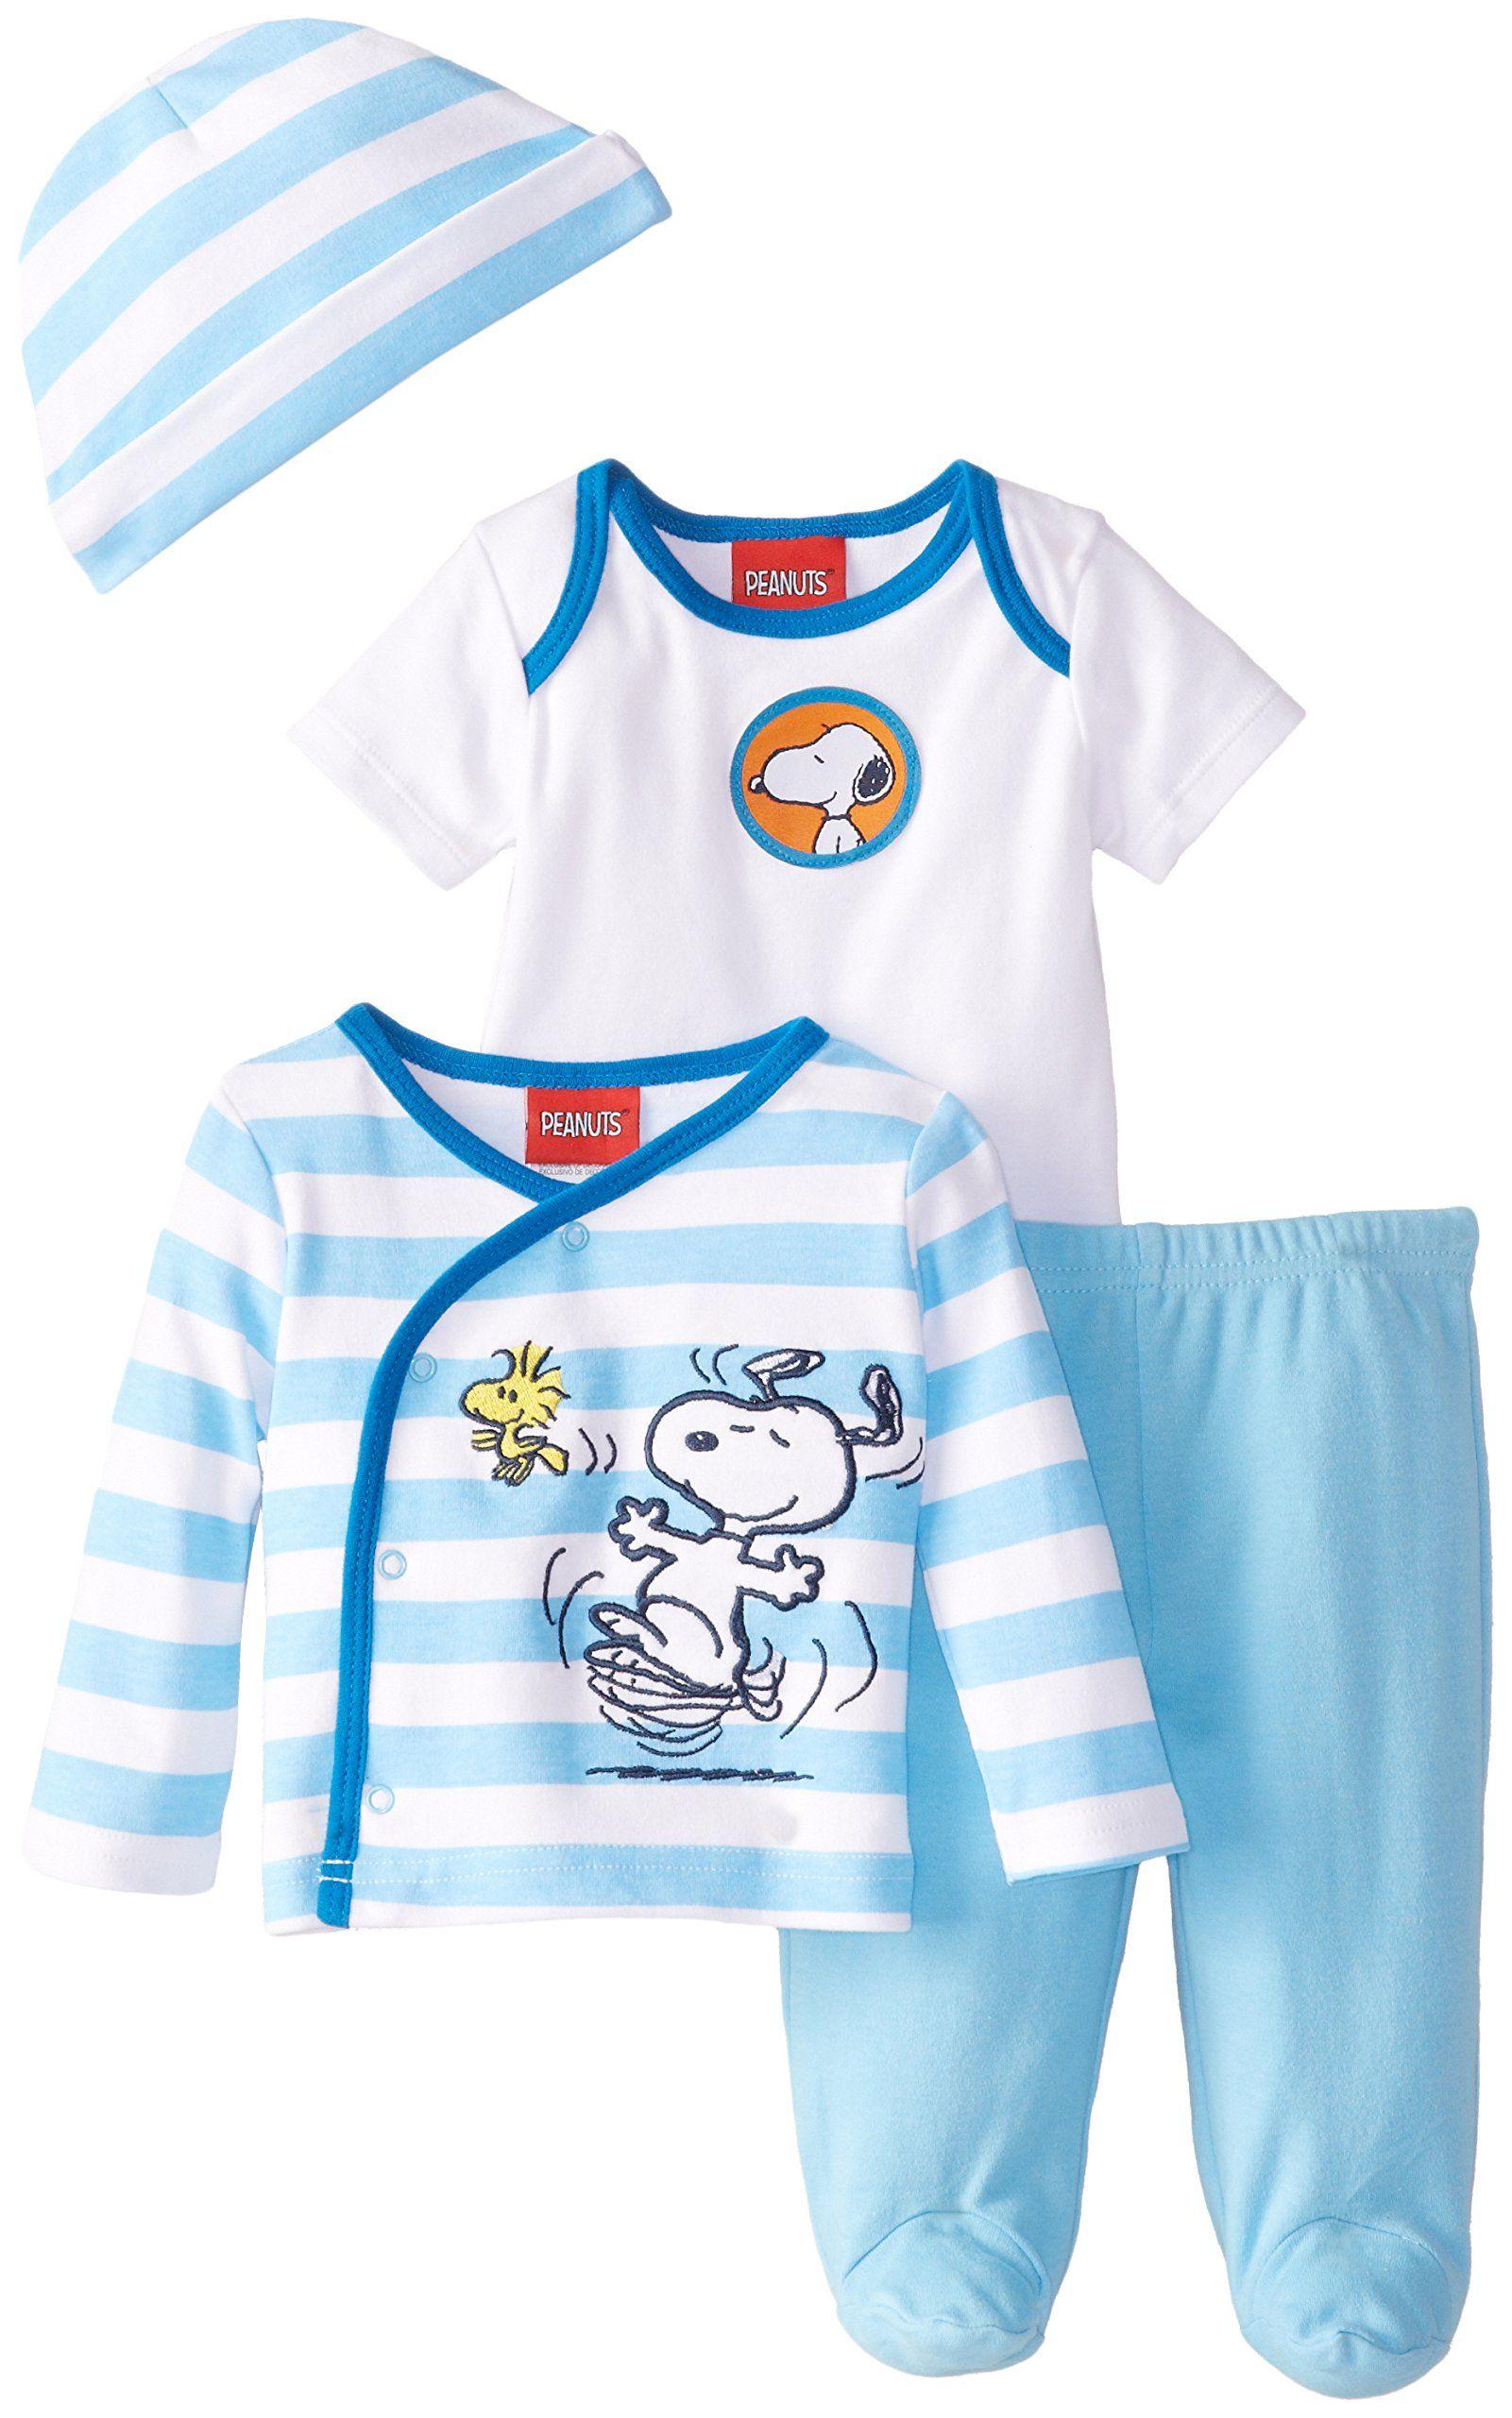 5d157b753 Peanuts Baby-Boys Newborn Boys Snoopy 4 Piece Gift Set